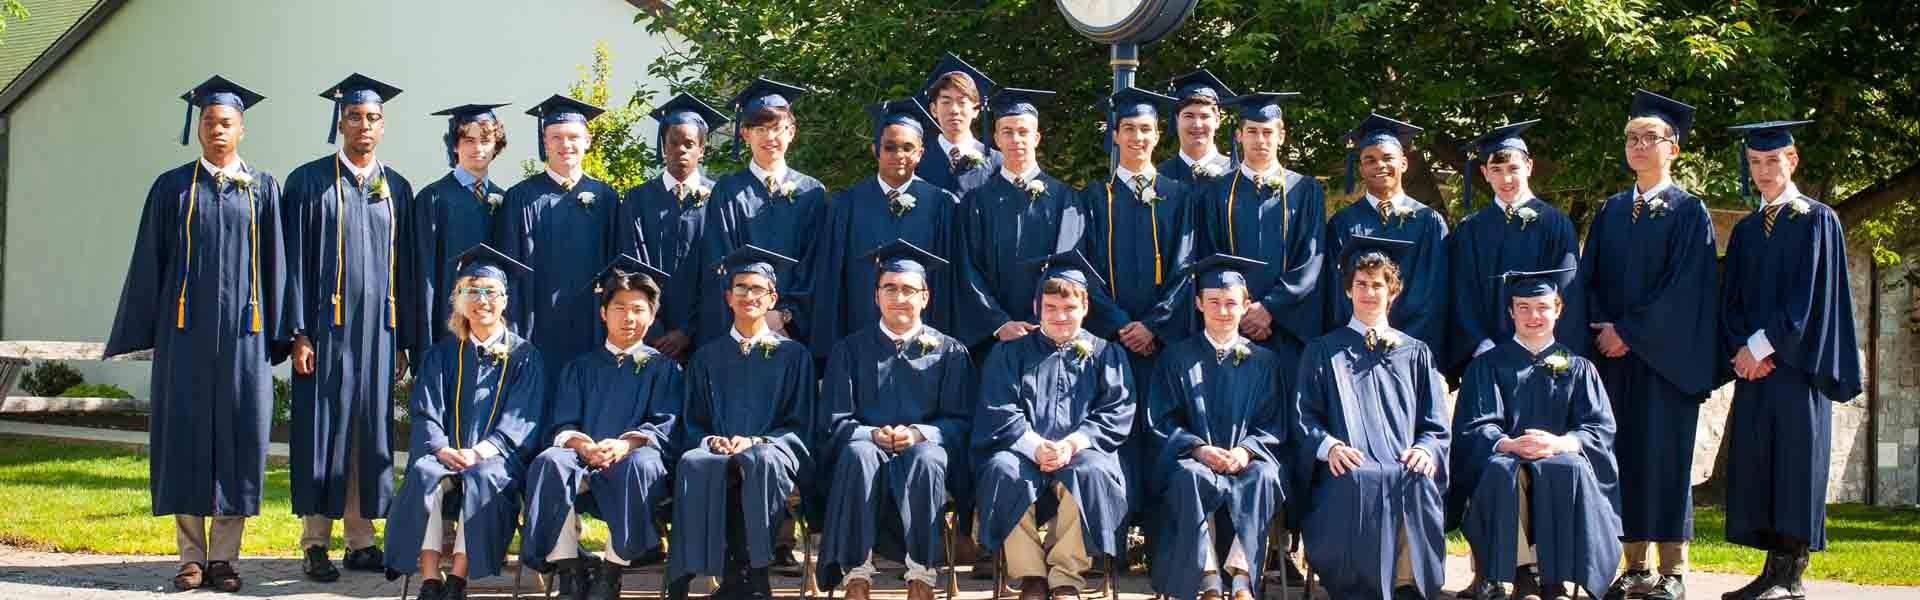 Phelps Pennsylvania USA Graduation Banner 2019